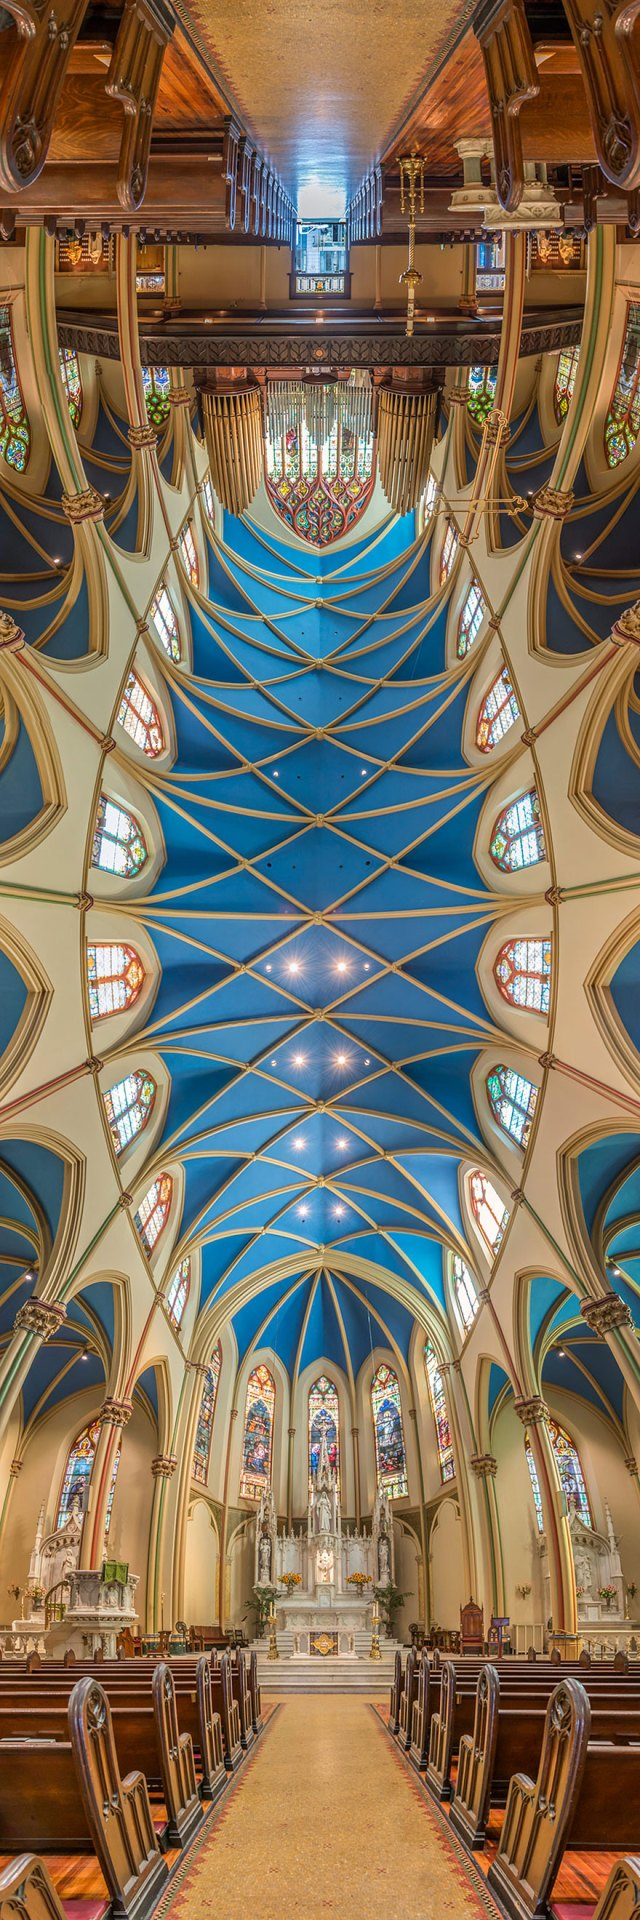 fotos-panoramicas-verticales-iglesias-nueva-york-richard-silver (1)